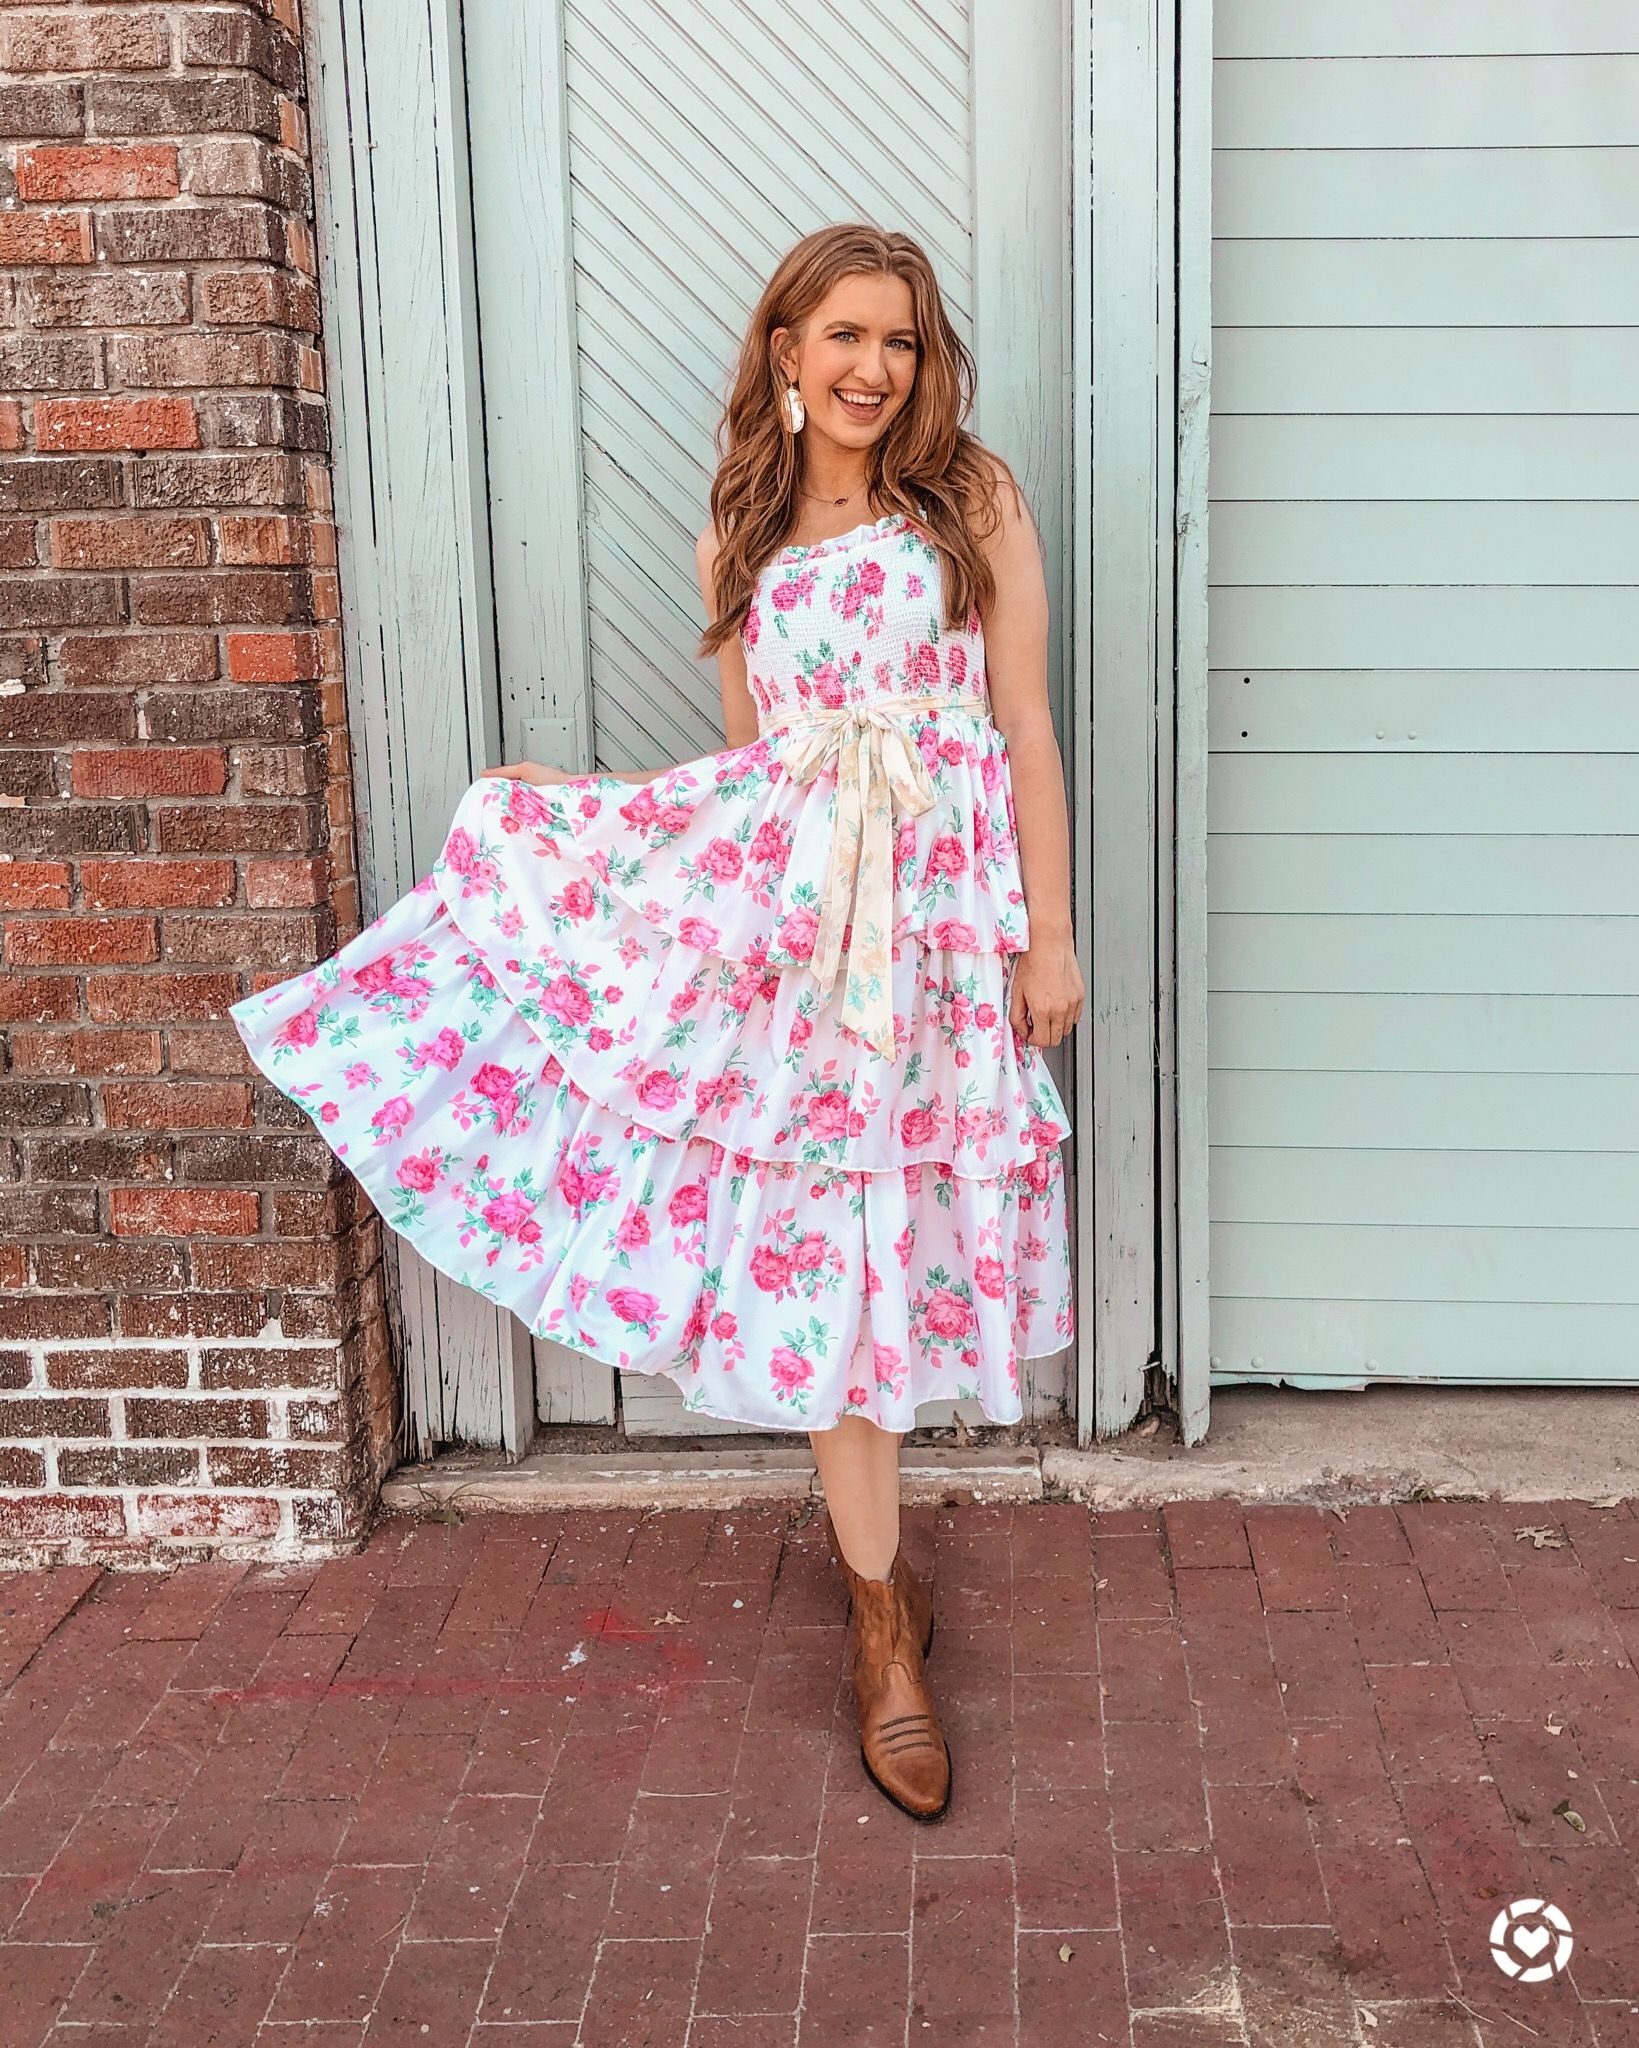 Loveshackfancy X Target Summer Dresses Sundress Fashion [ 2048 x 1639 Pixel ]